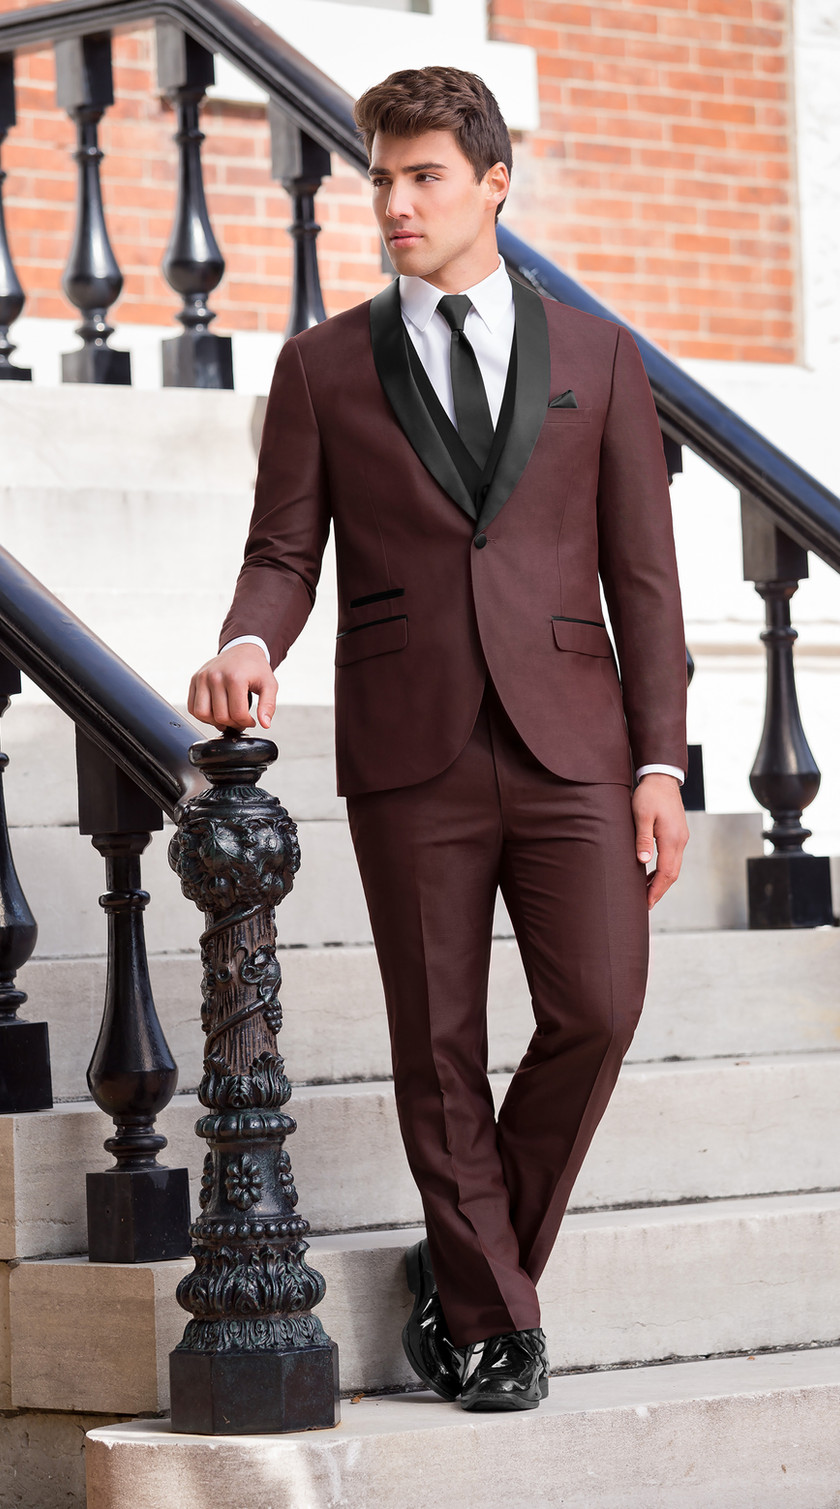 Burgundy tuxedo tux suit purchase retail red black tie holiday Phoenix Arizona Scottsdale Tempe Glendale Peoria